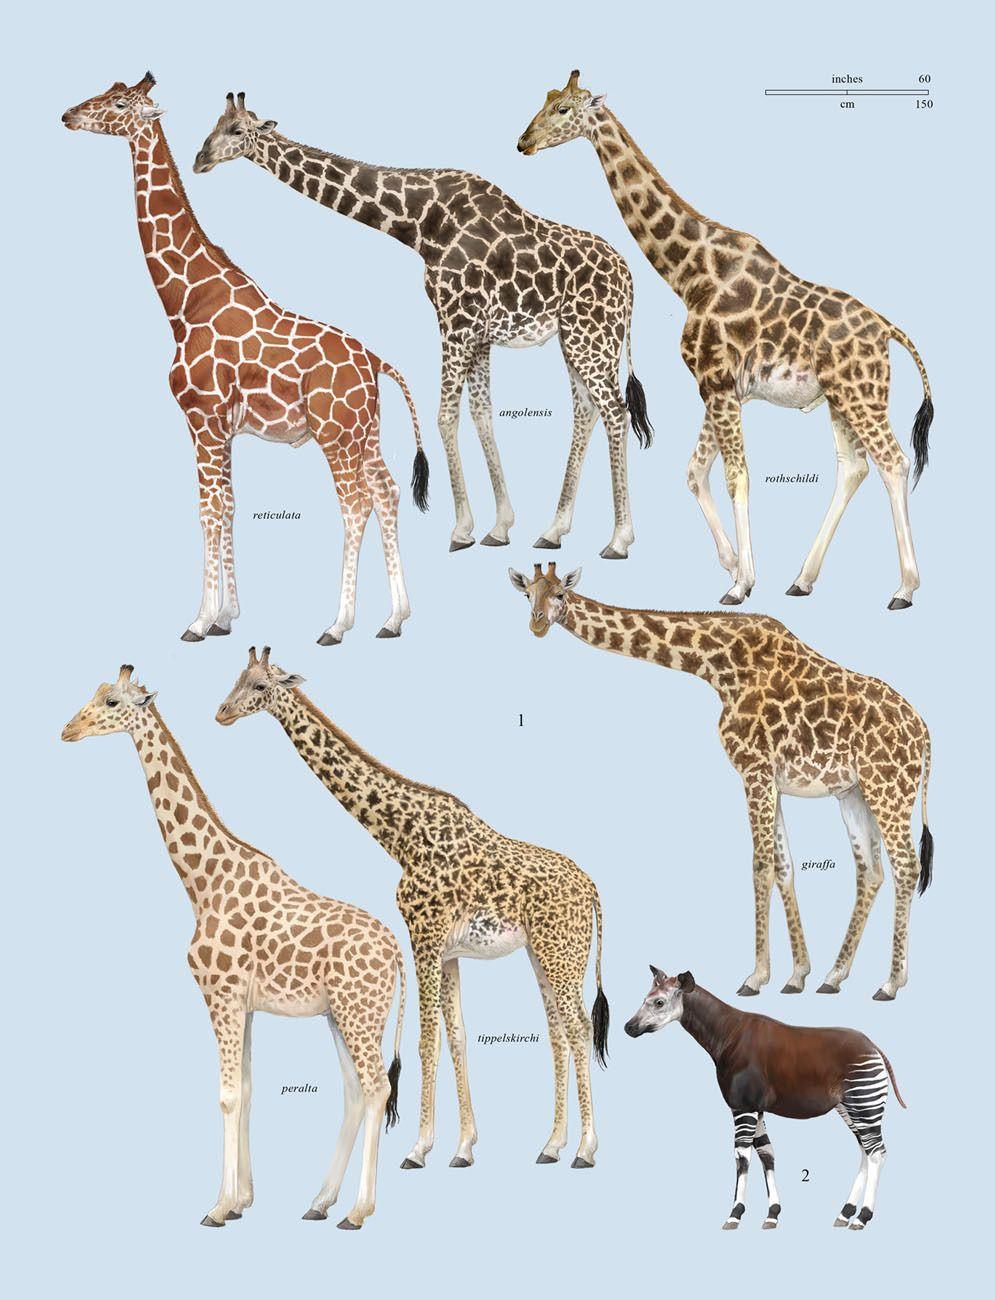 Family Giraffidae Giraffe And Okapi Plate From The Handbook Of